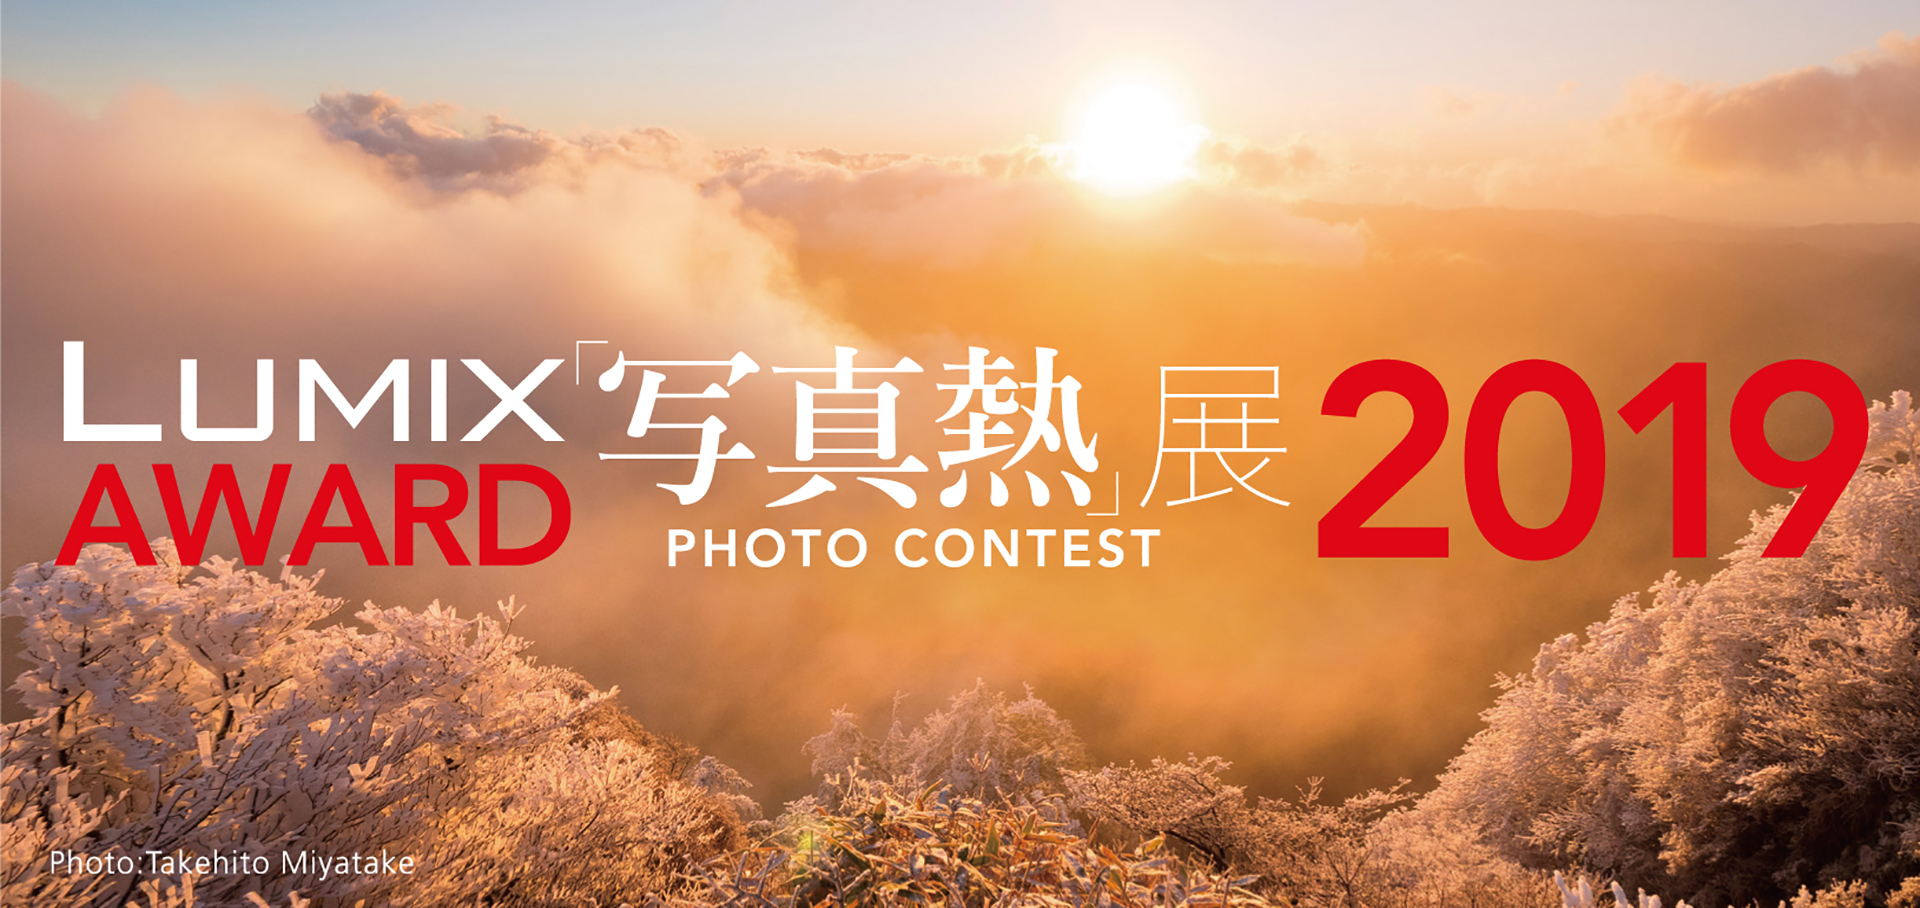 LUMIX AWARD 2019『写真熱』展バナー